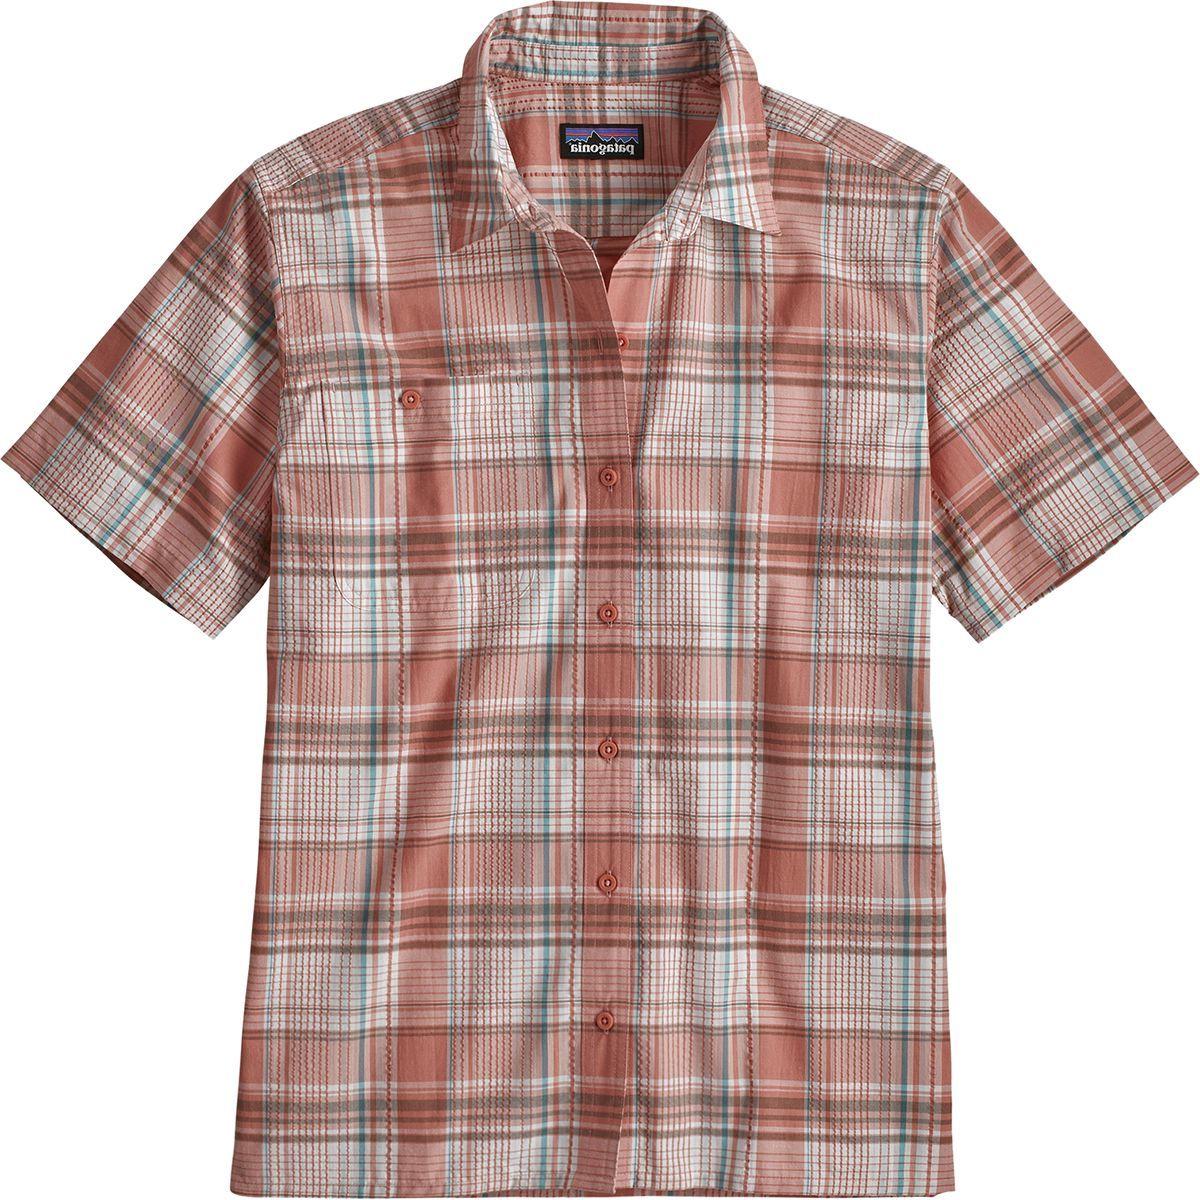 Patagonia Puckerware Shirt - Men's